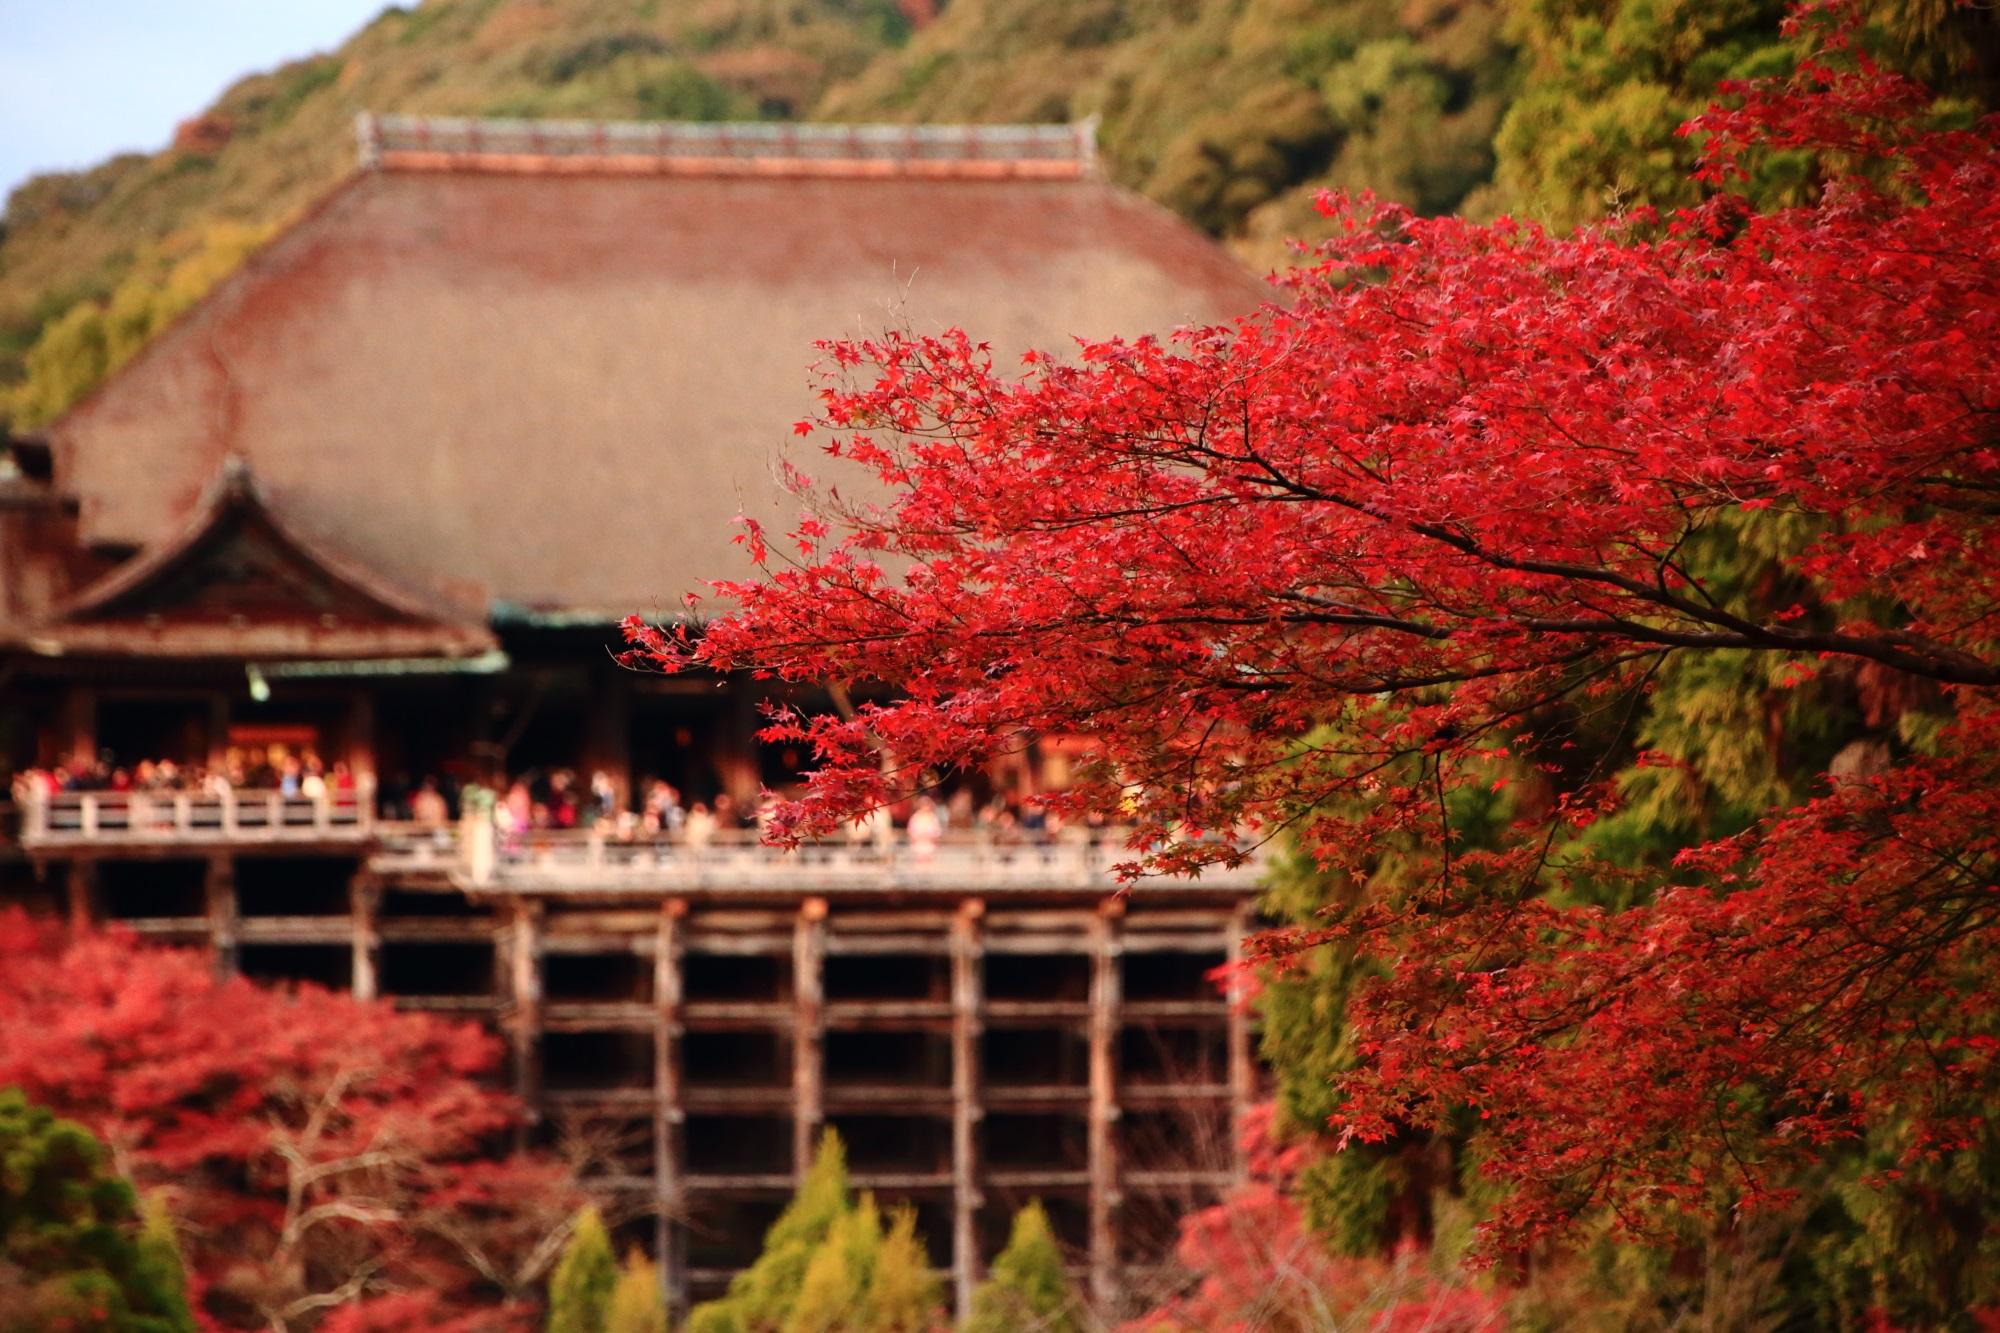 Kiyomizu-dera Temple Kyoto autumn leaves 紅葉 見ごろ 夕焼け 秋